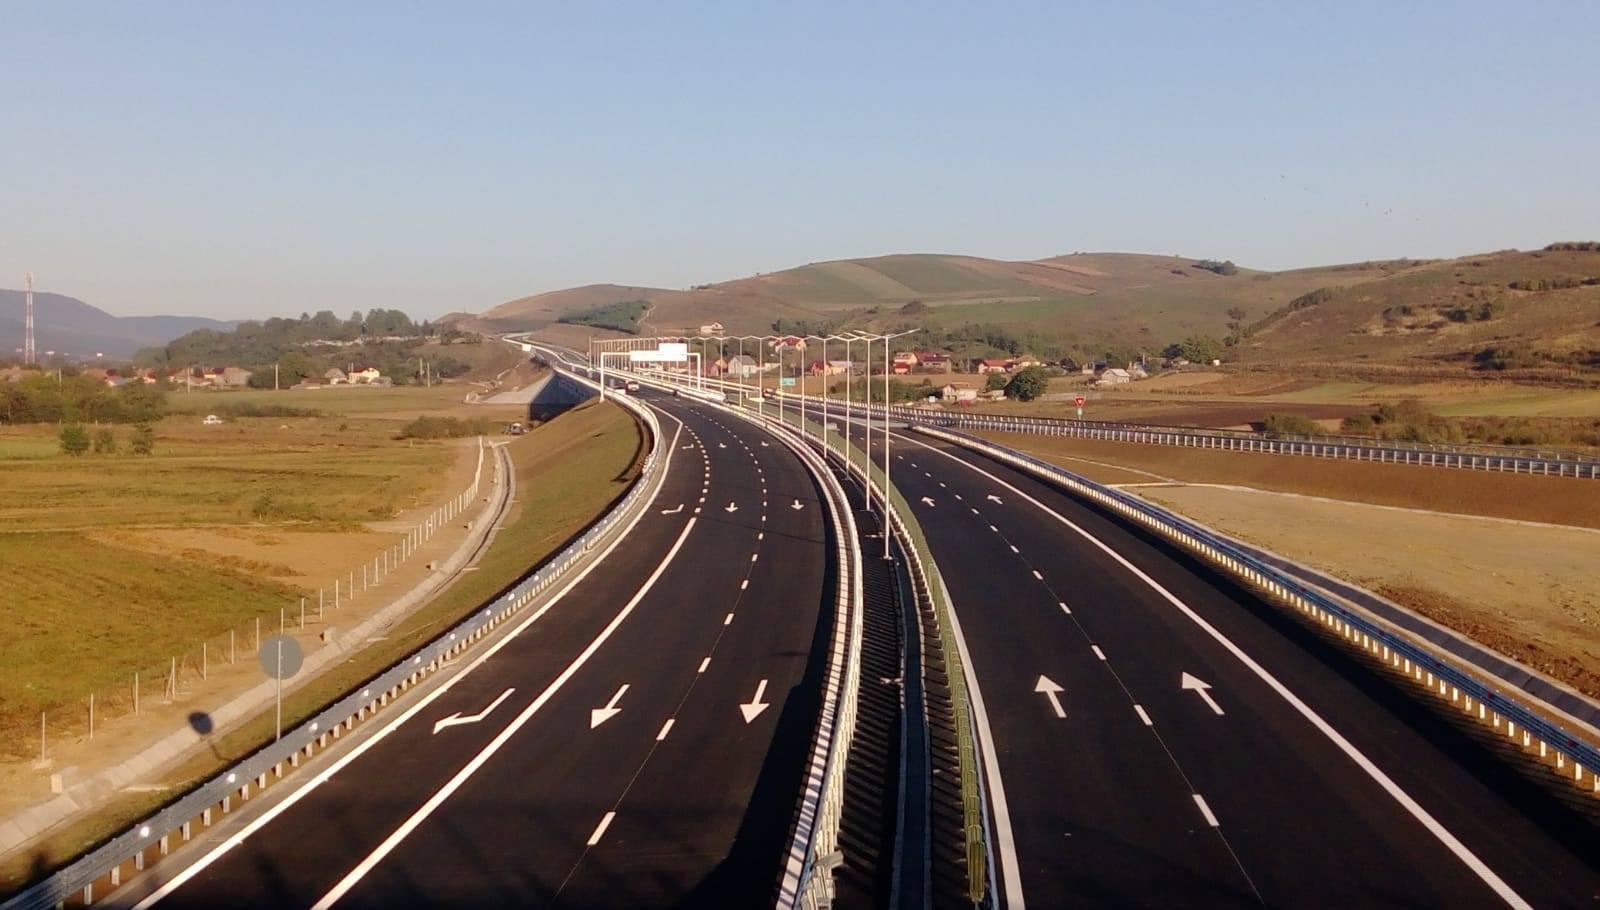 cnair-are-100-de-kilometri-de-autostrada-construiti-